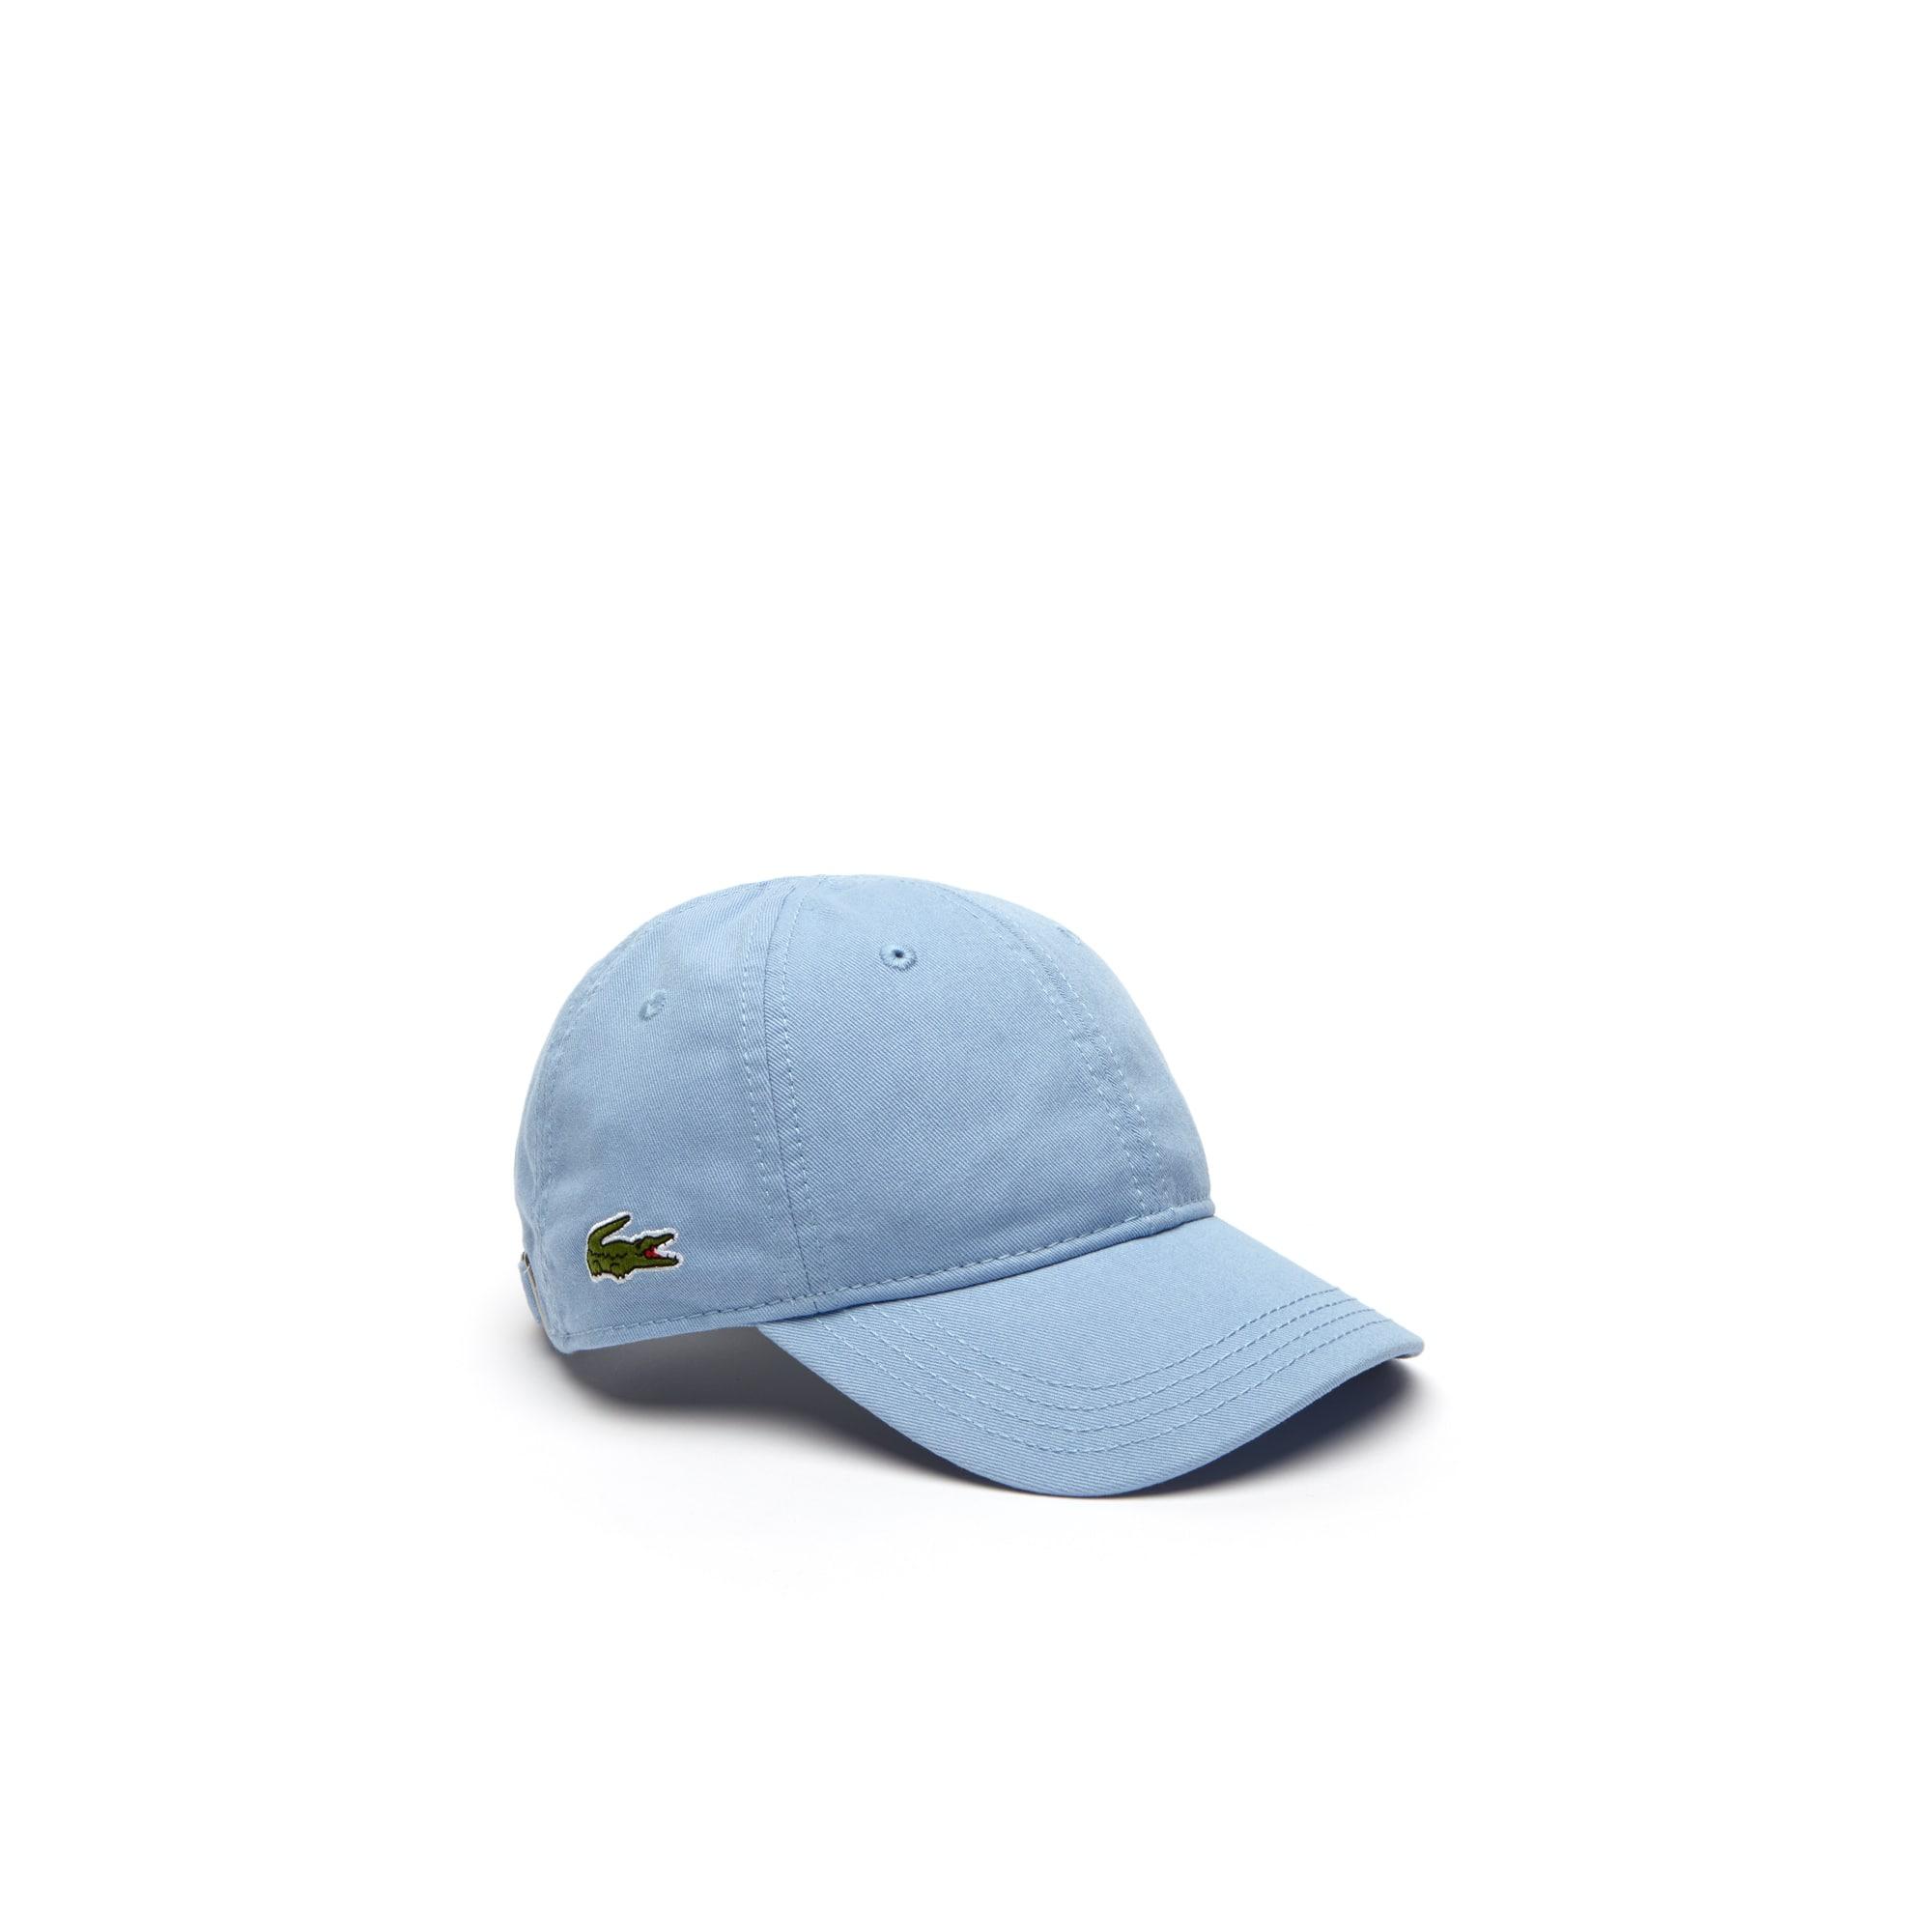 Boys' Solid gabardine cap